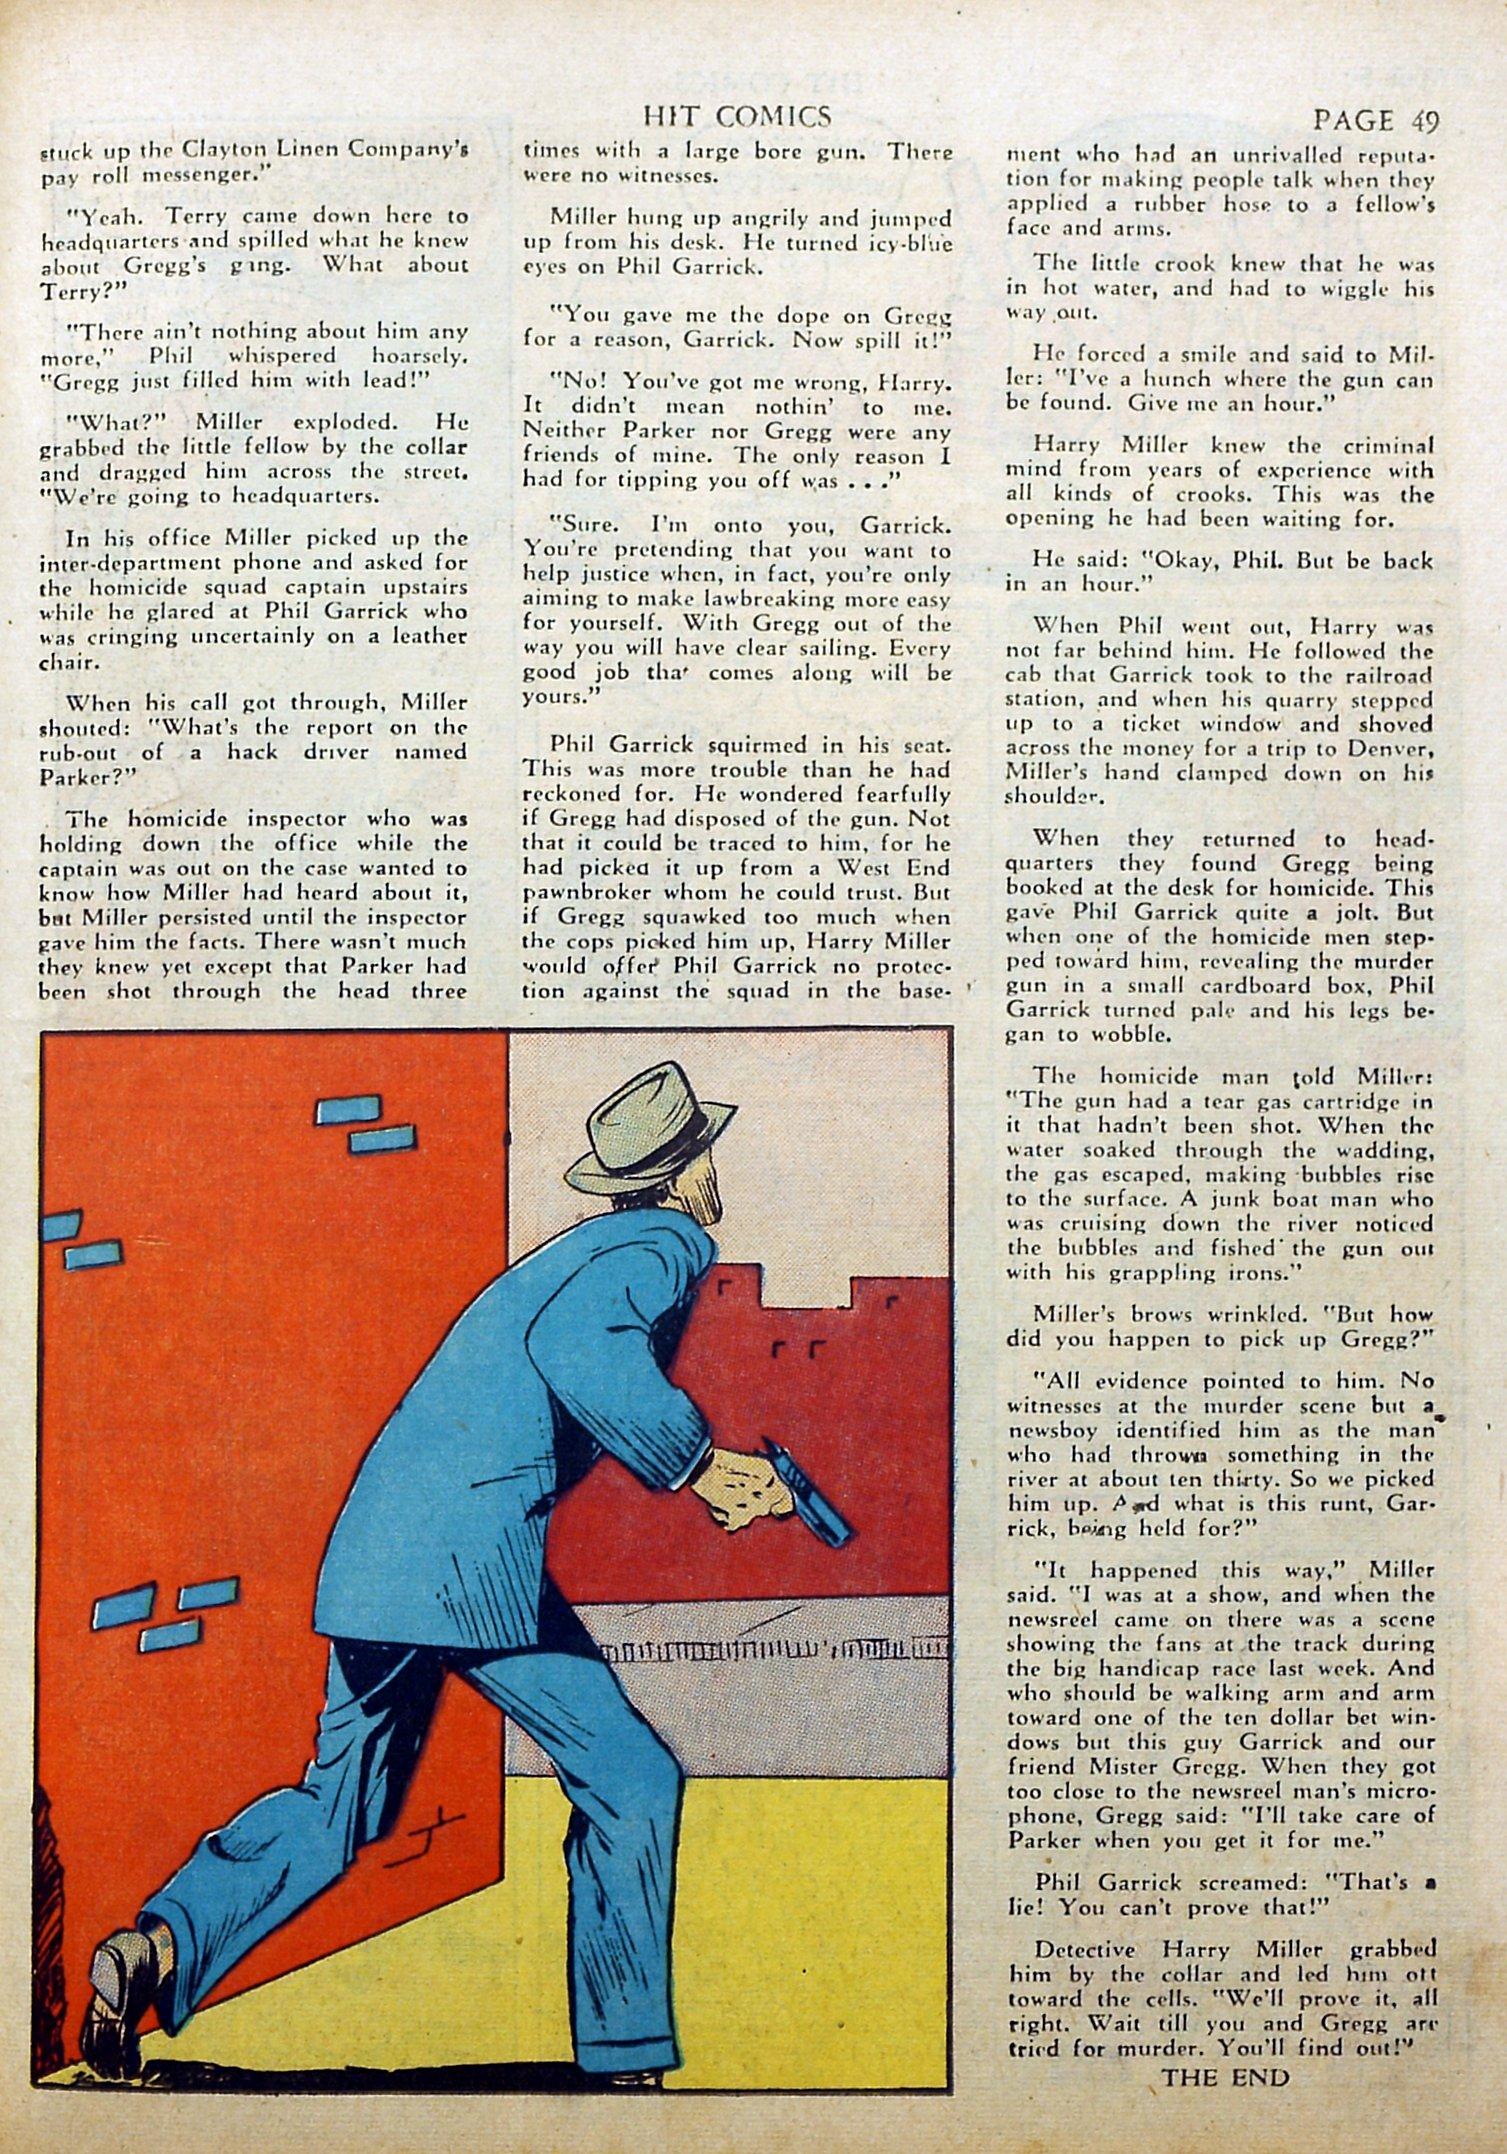 Read online Hit Comics comic -  Issue #17 - 51